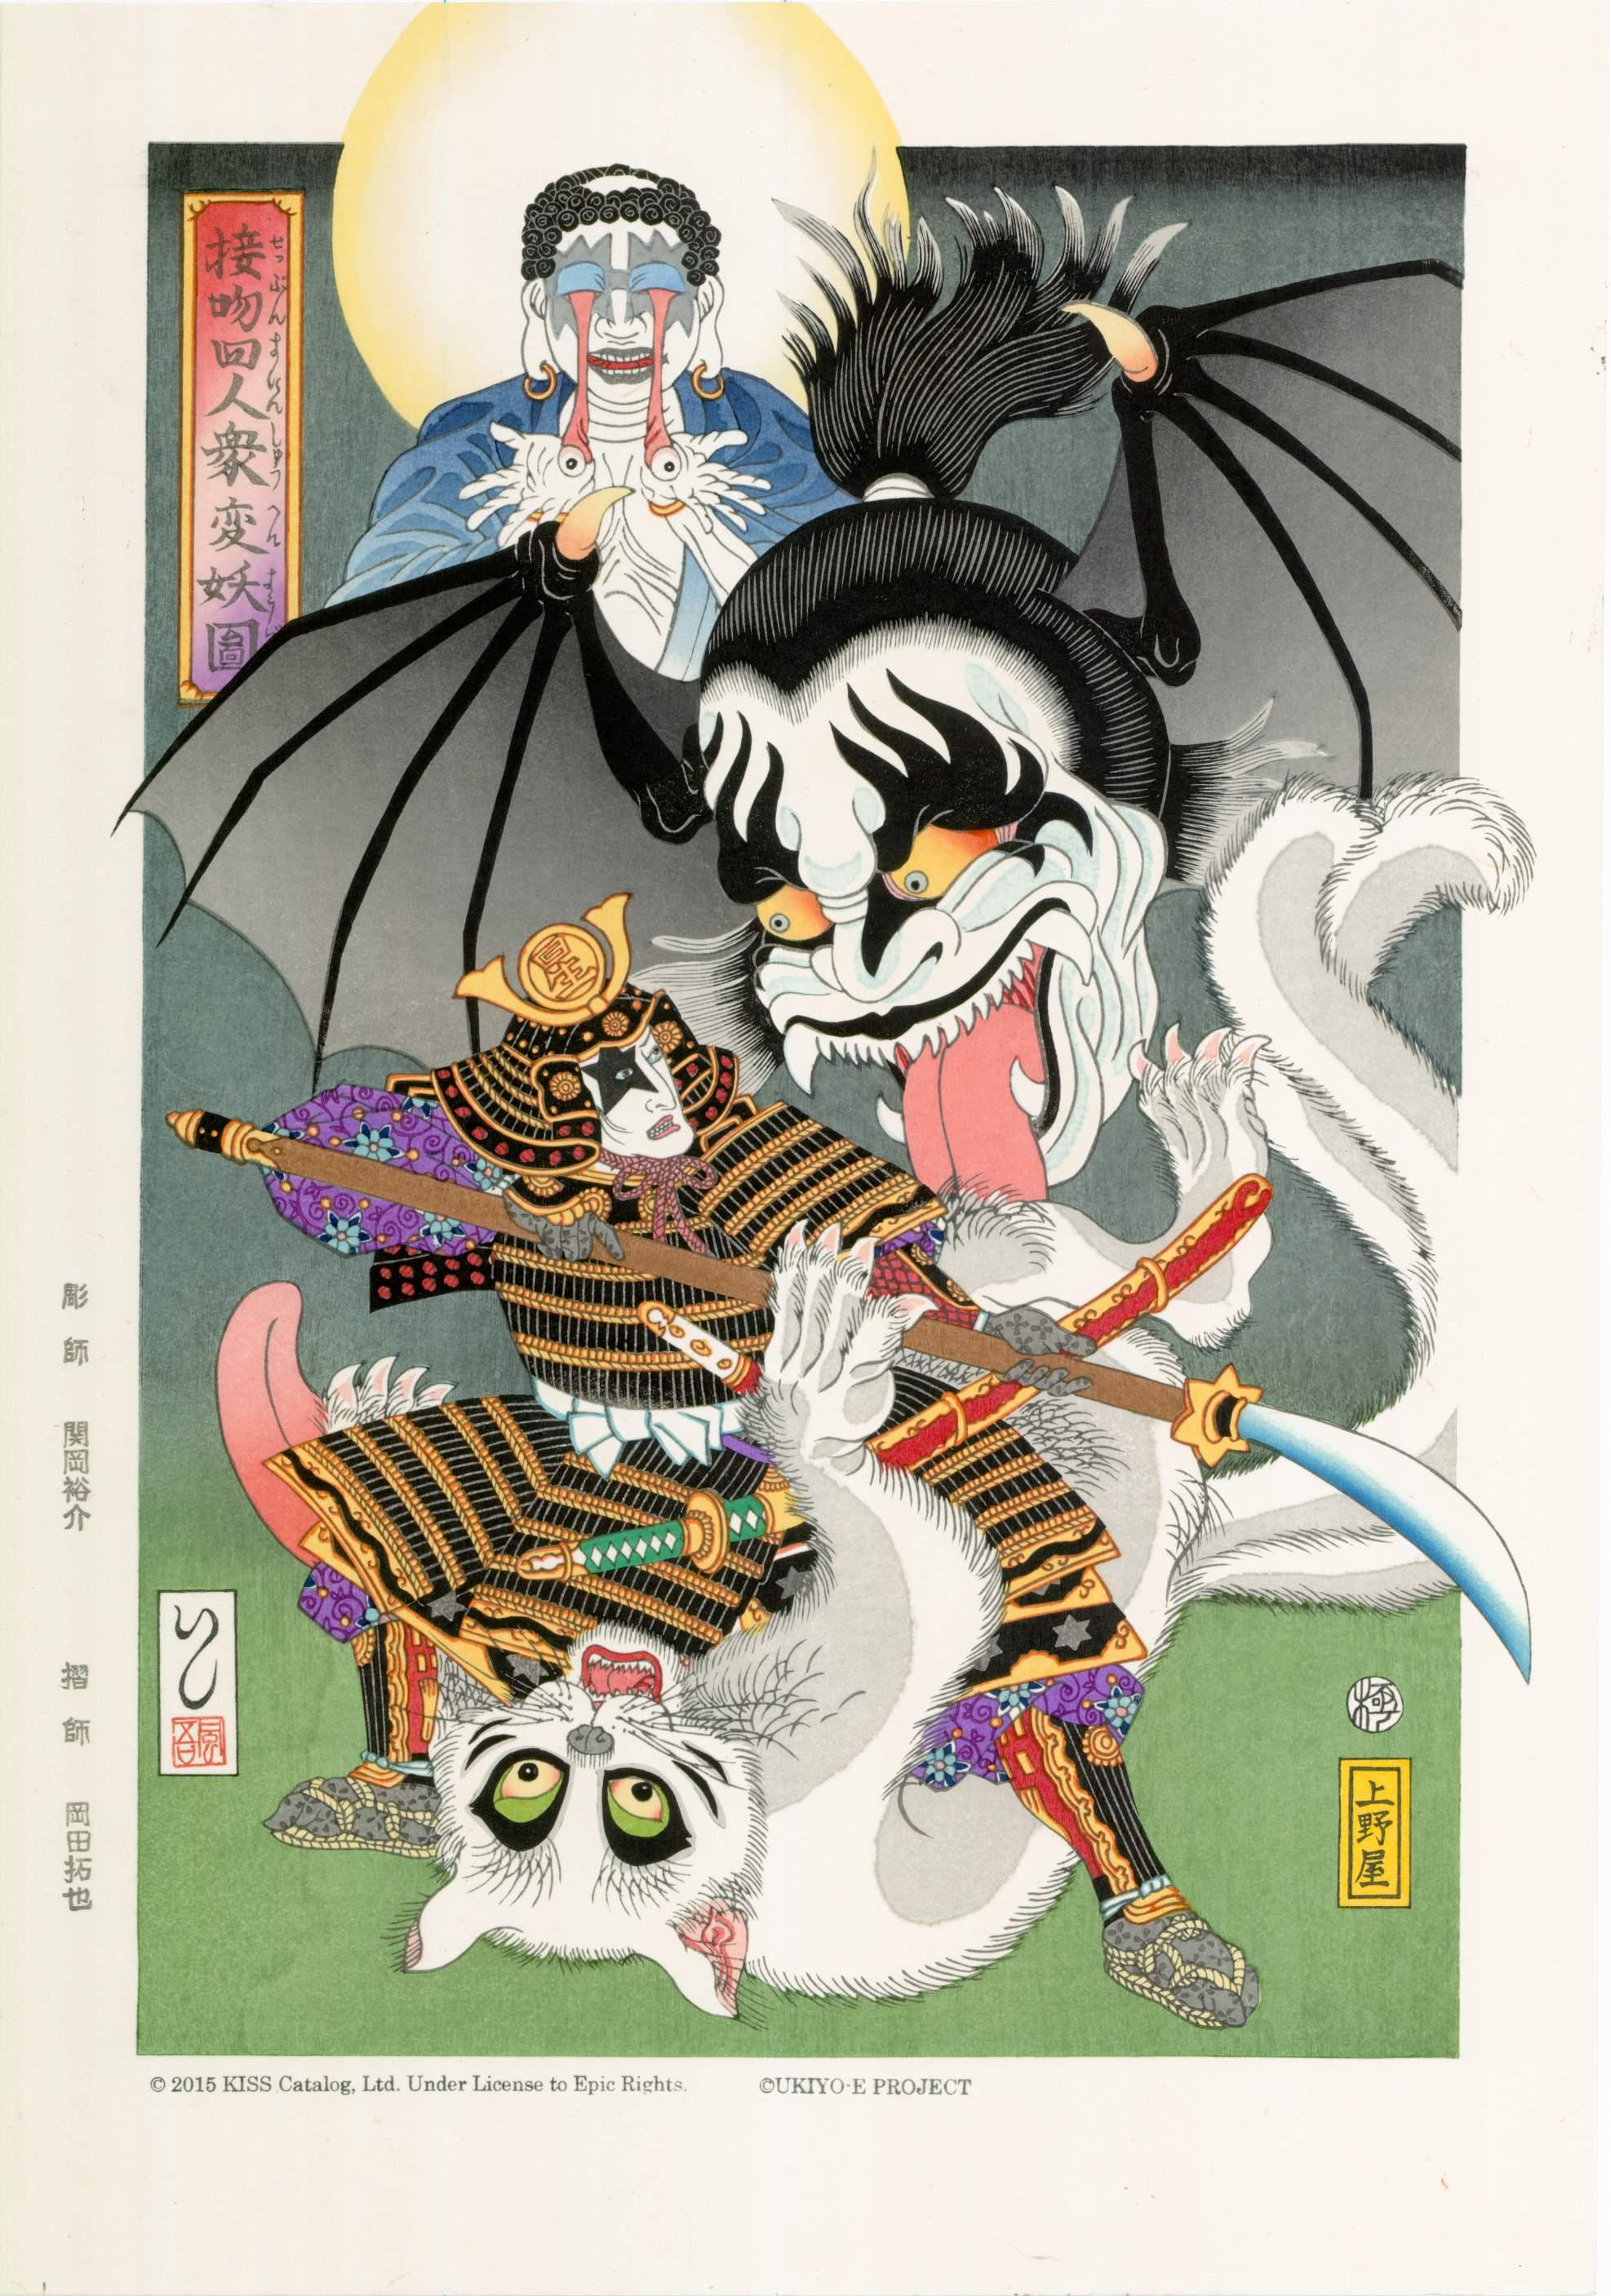 NekoPOP-KISS-Ukiyo-e-Monstrous-1